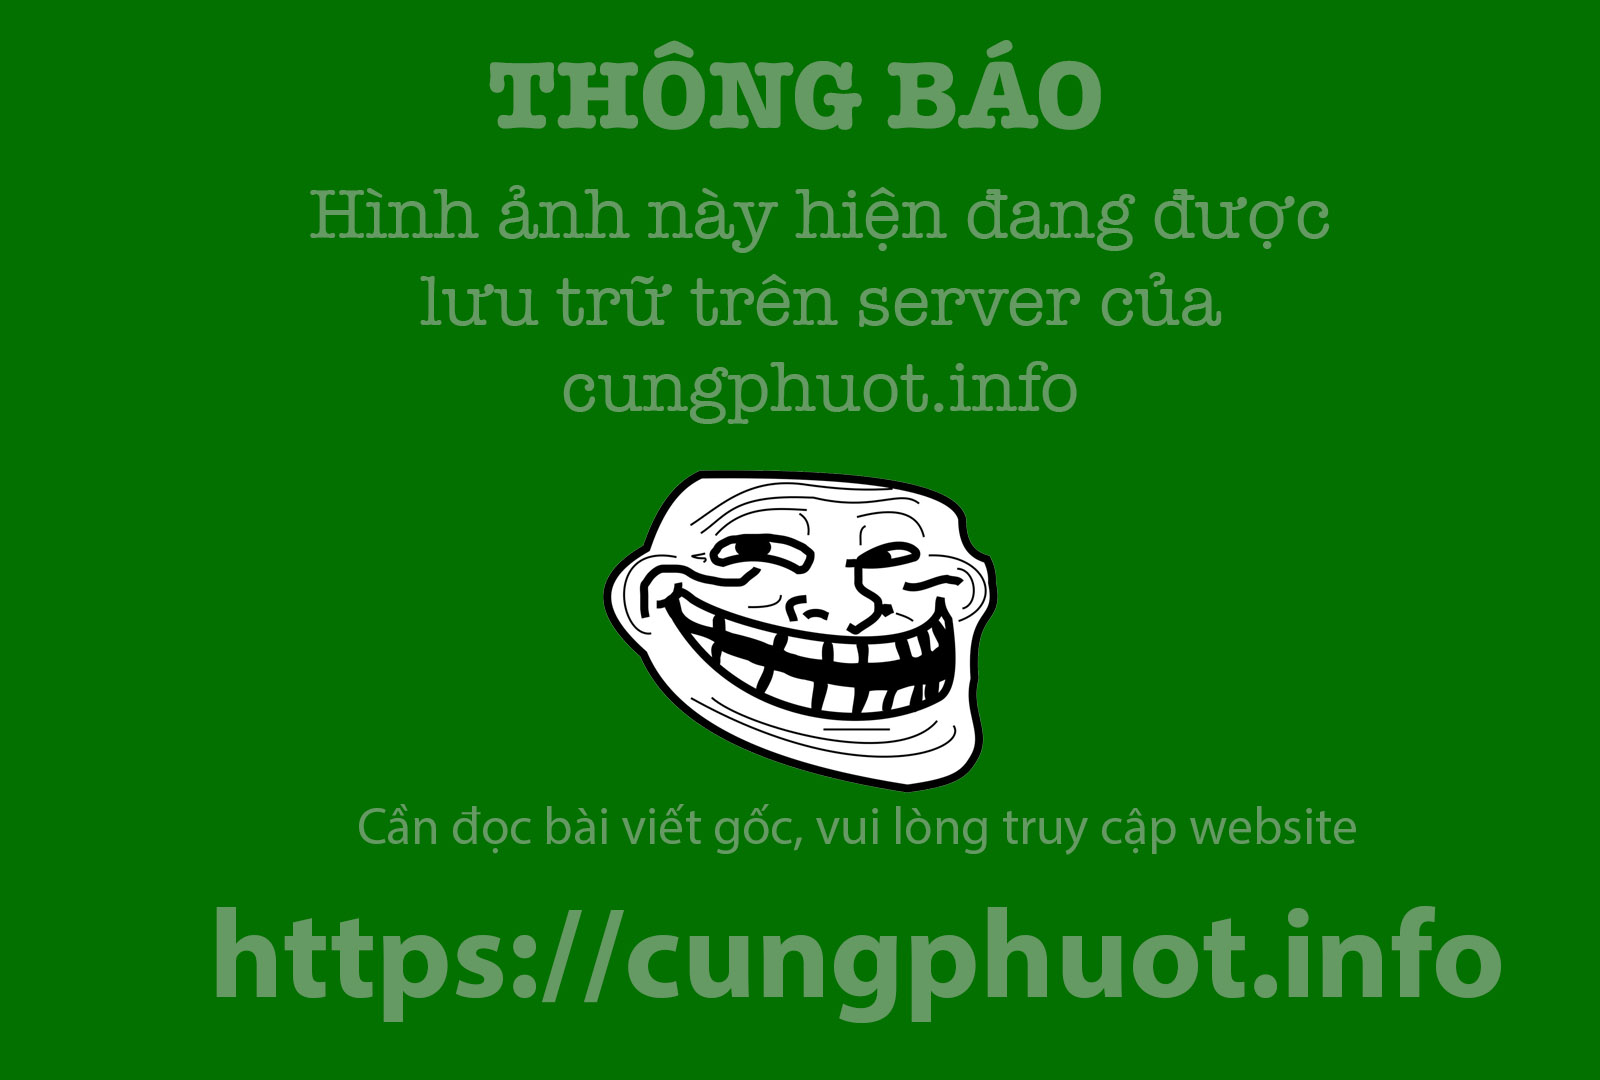 Dan phuot me man ve dep ky vi cua hang Prai o Quang Tri hinh anh 13